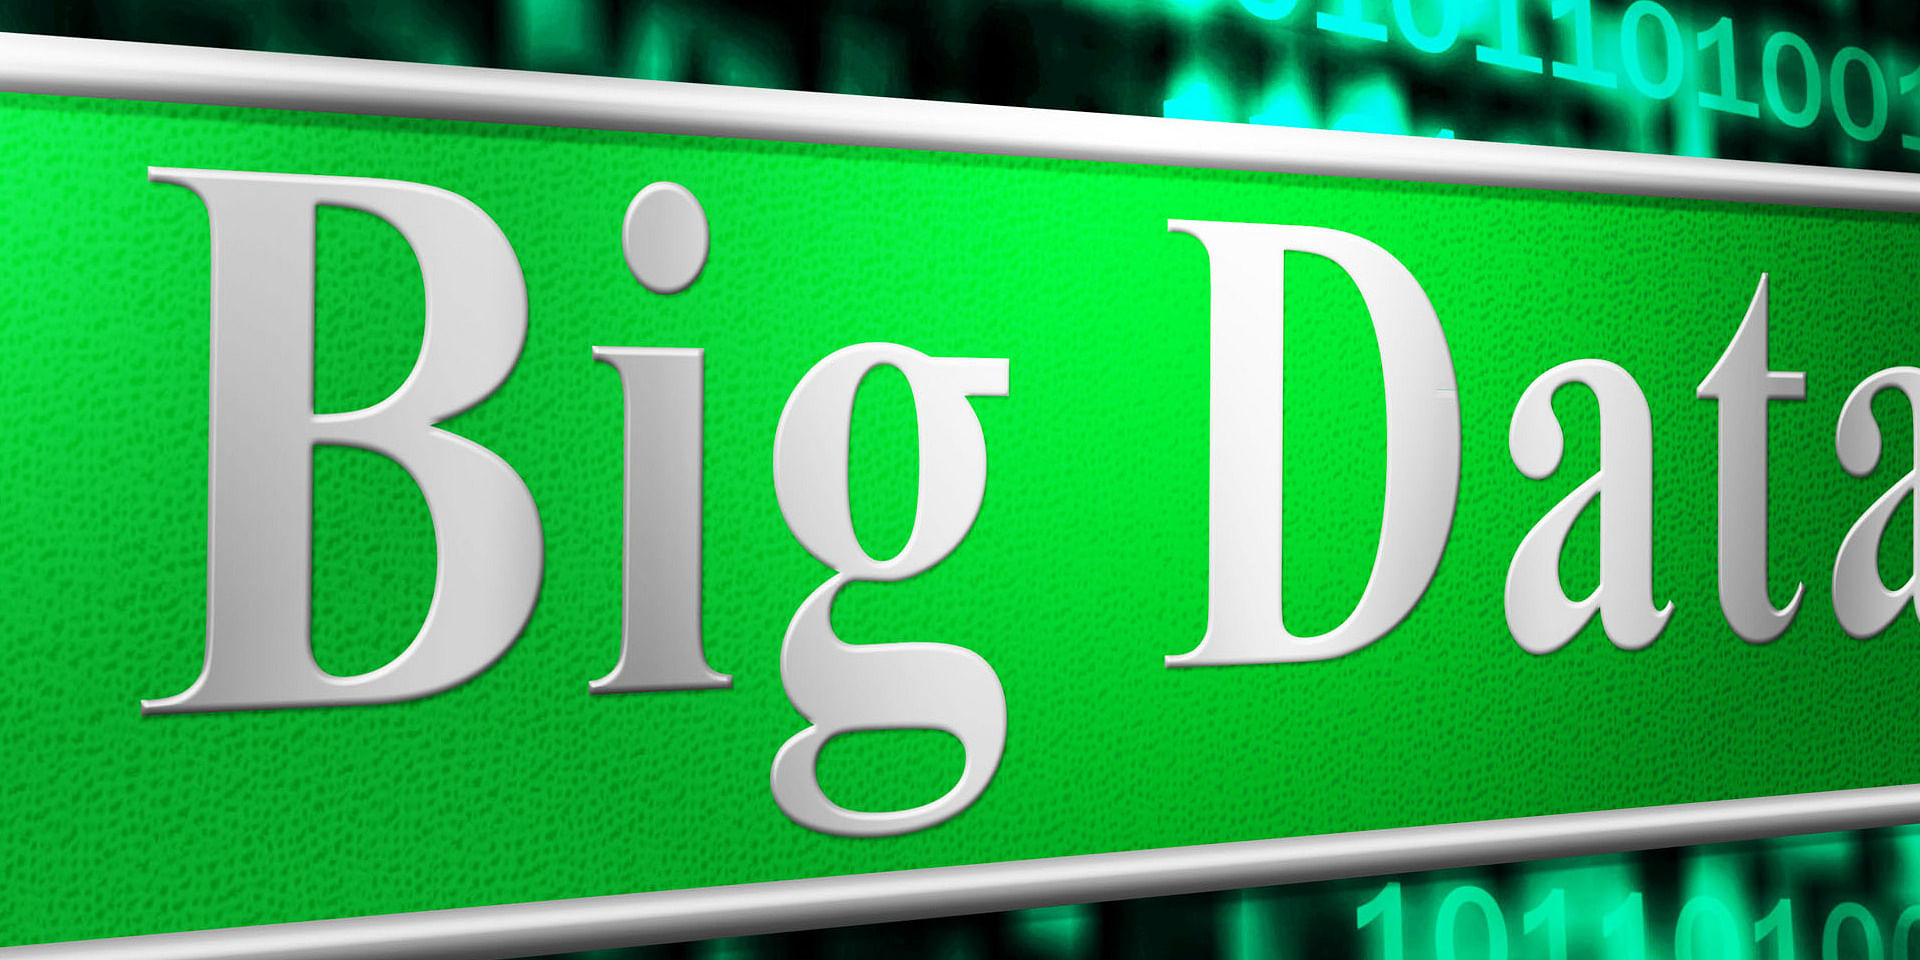 Big Data<br>